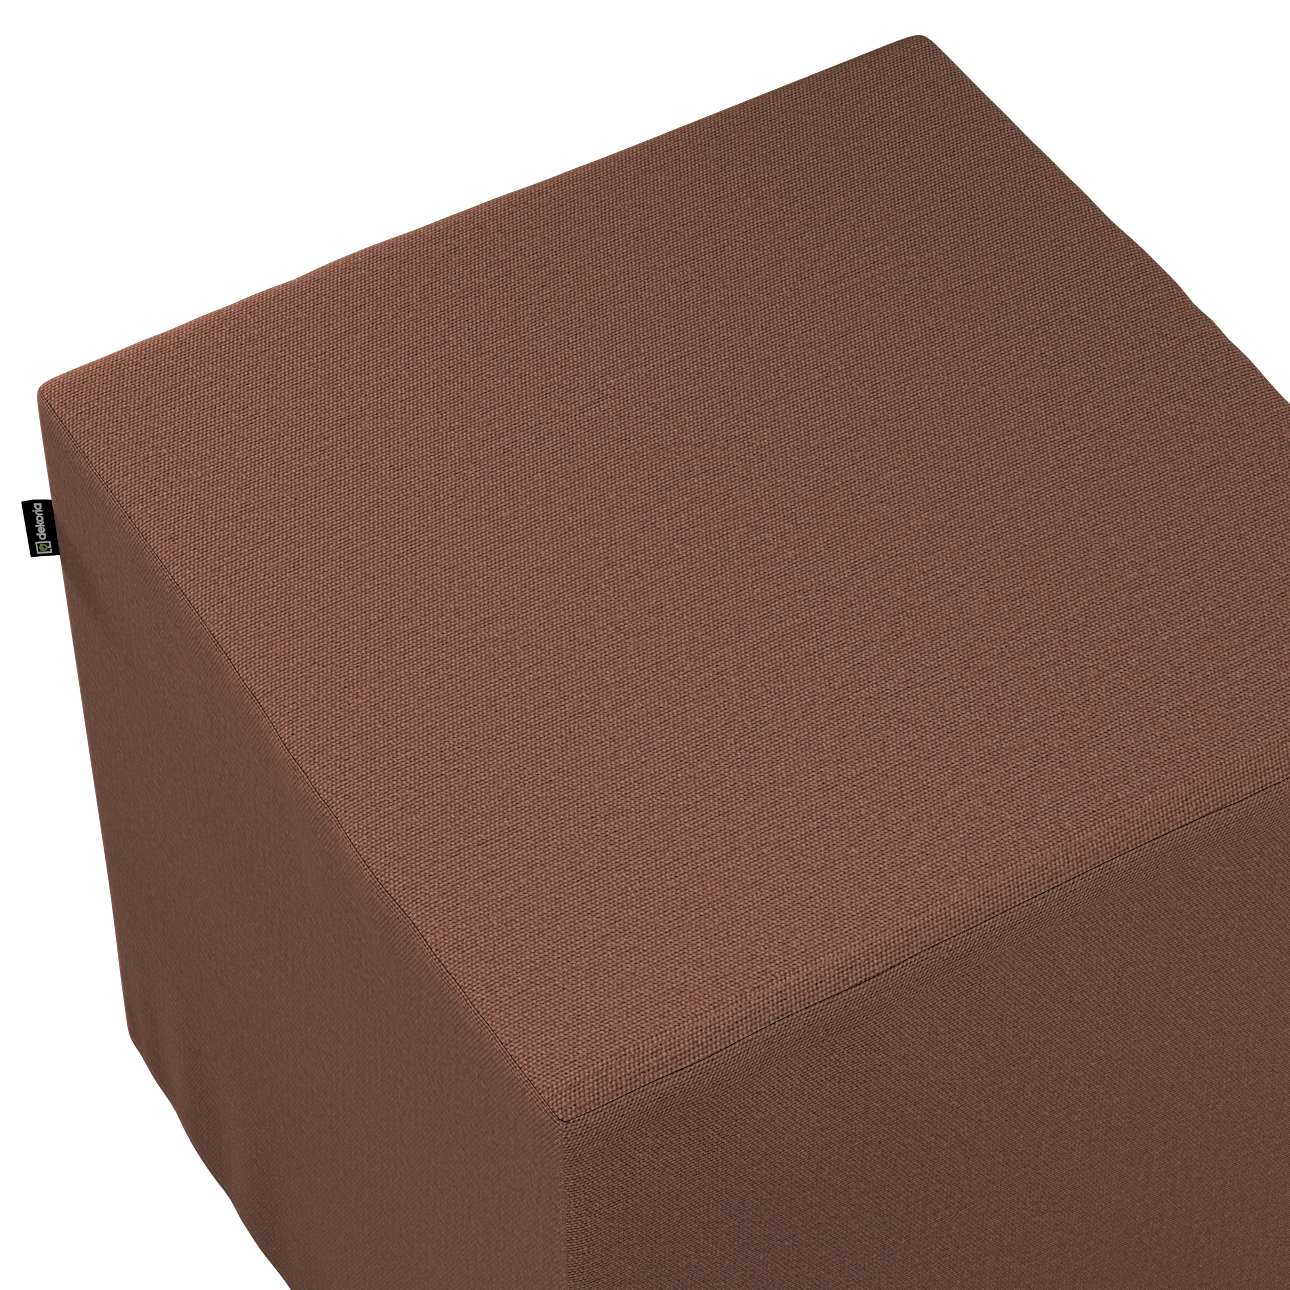 Pufa kostka w kolekcji Loneta, tkanina: 133-09